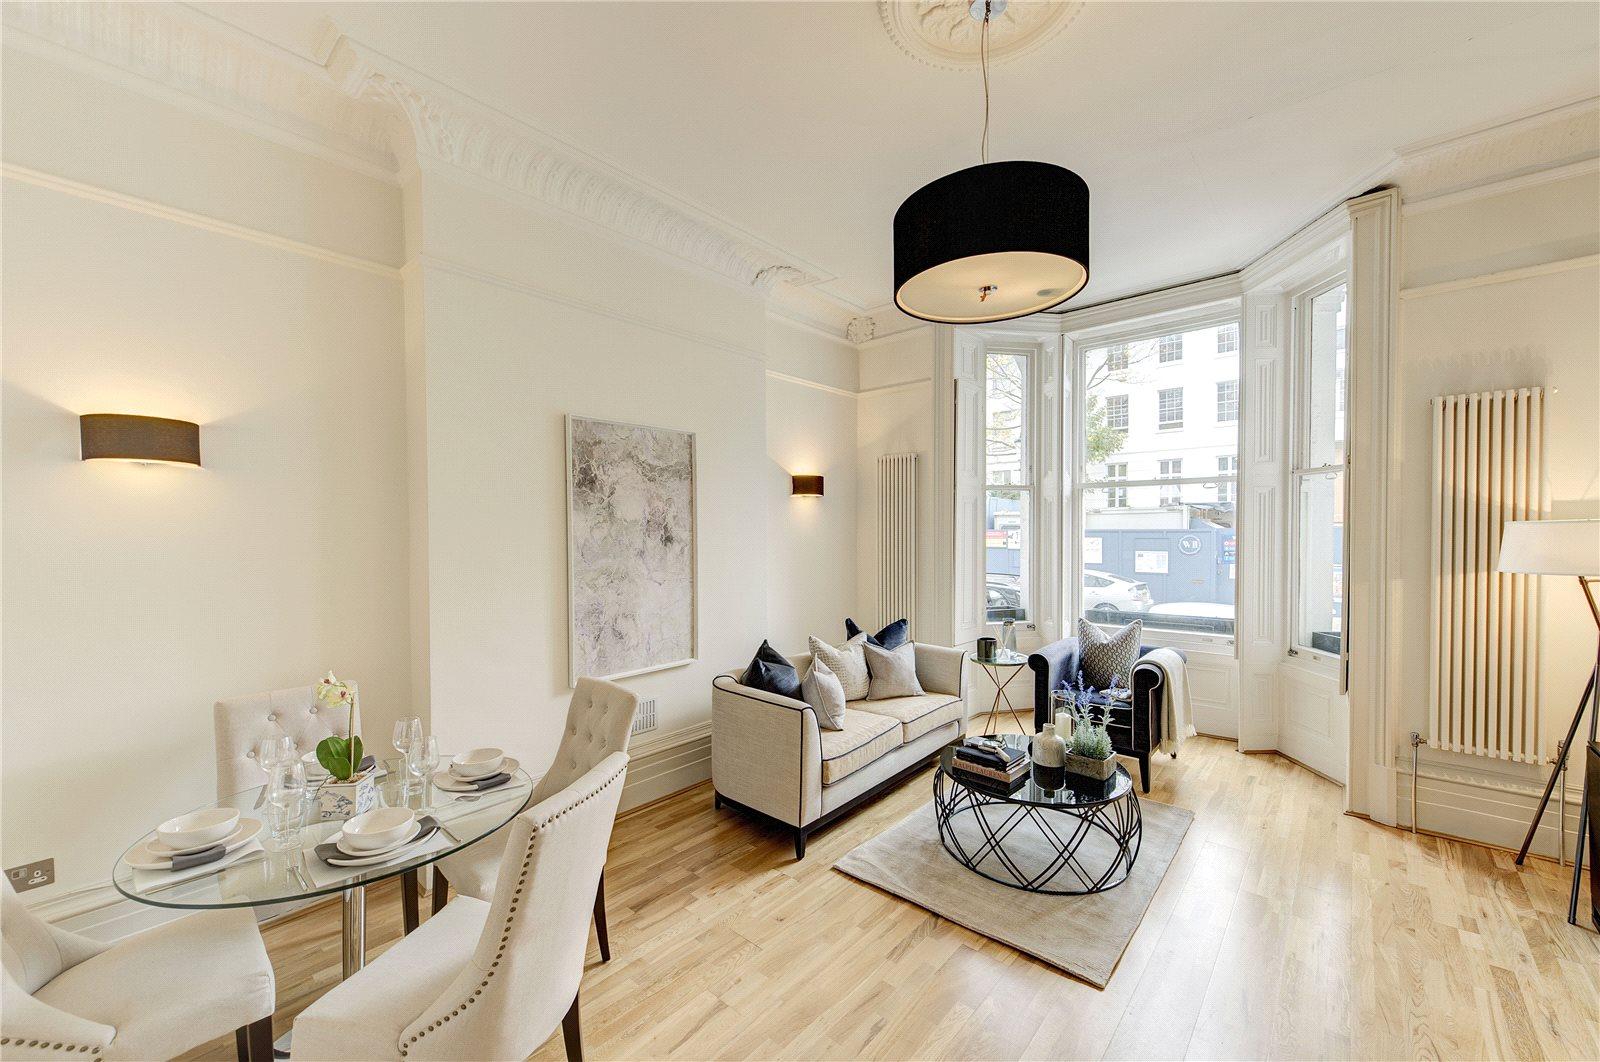 公寓 为 销售 在 Ladbroke Terrace, Notting Hill, W11 Notting Hill, 英格兰